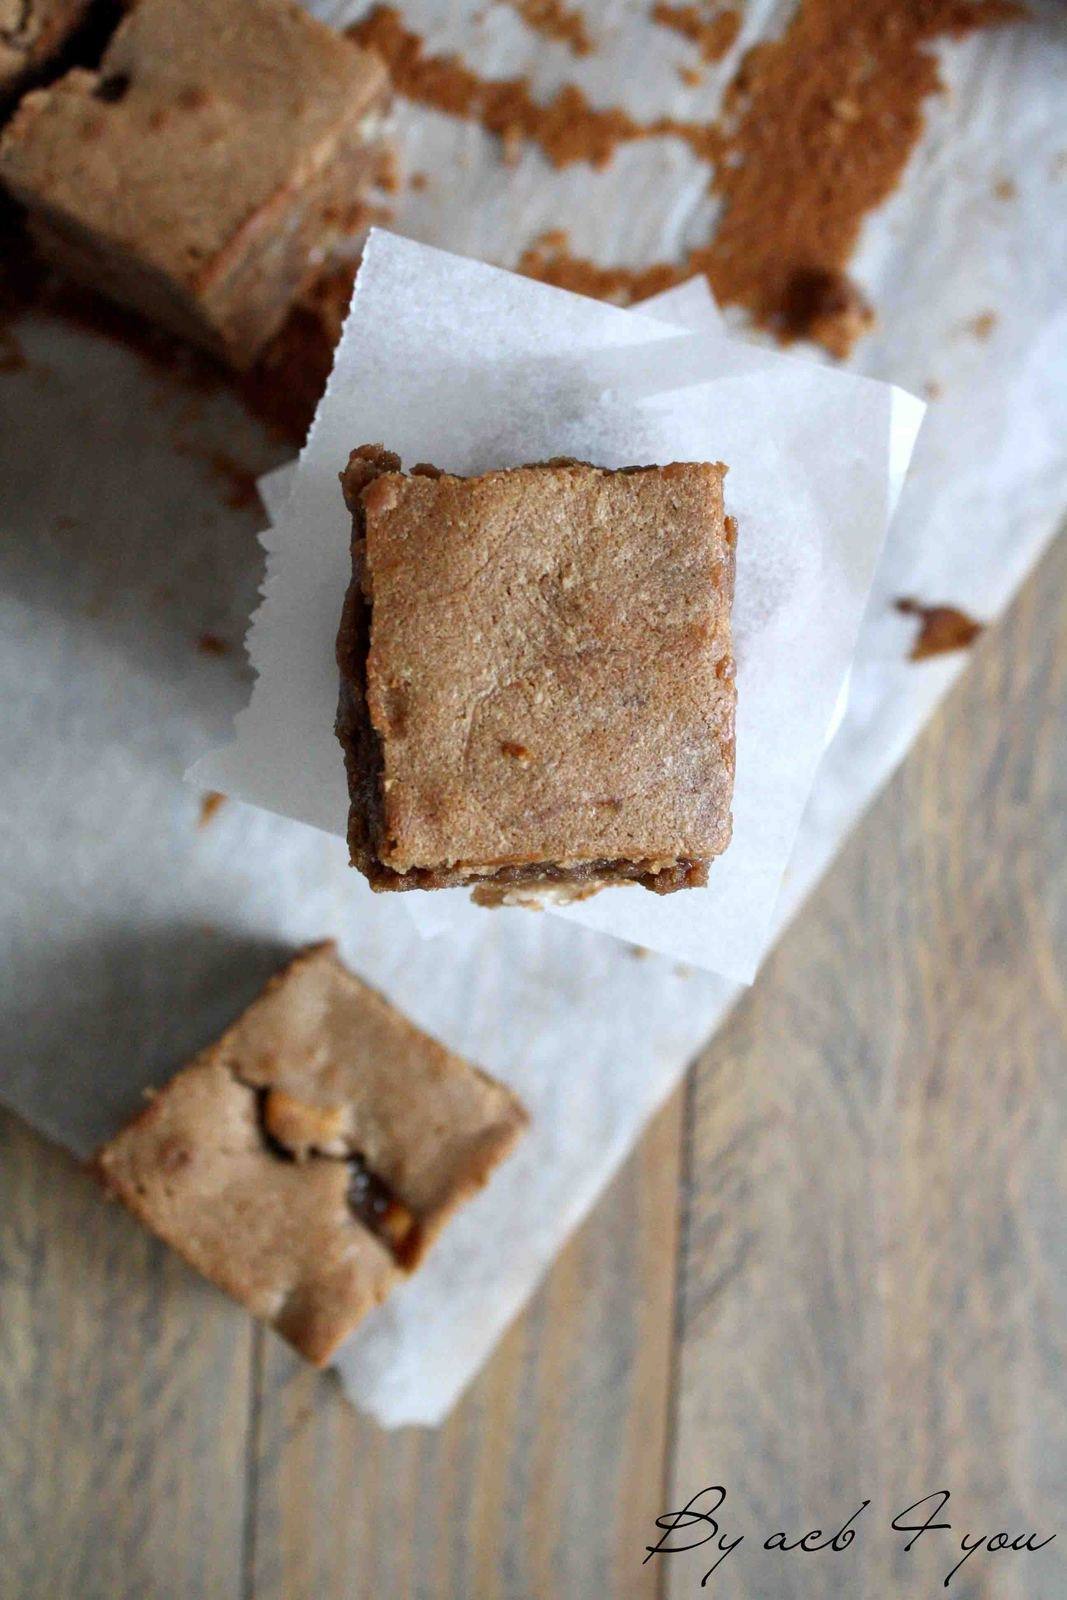 Fondant au chocolat caramel, noix de macadamia